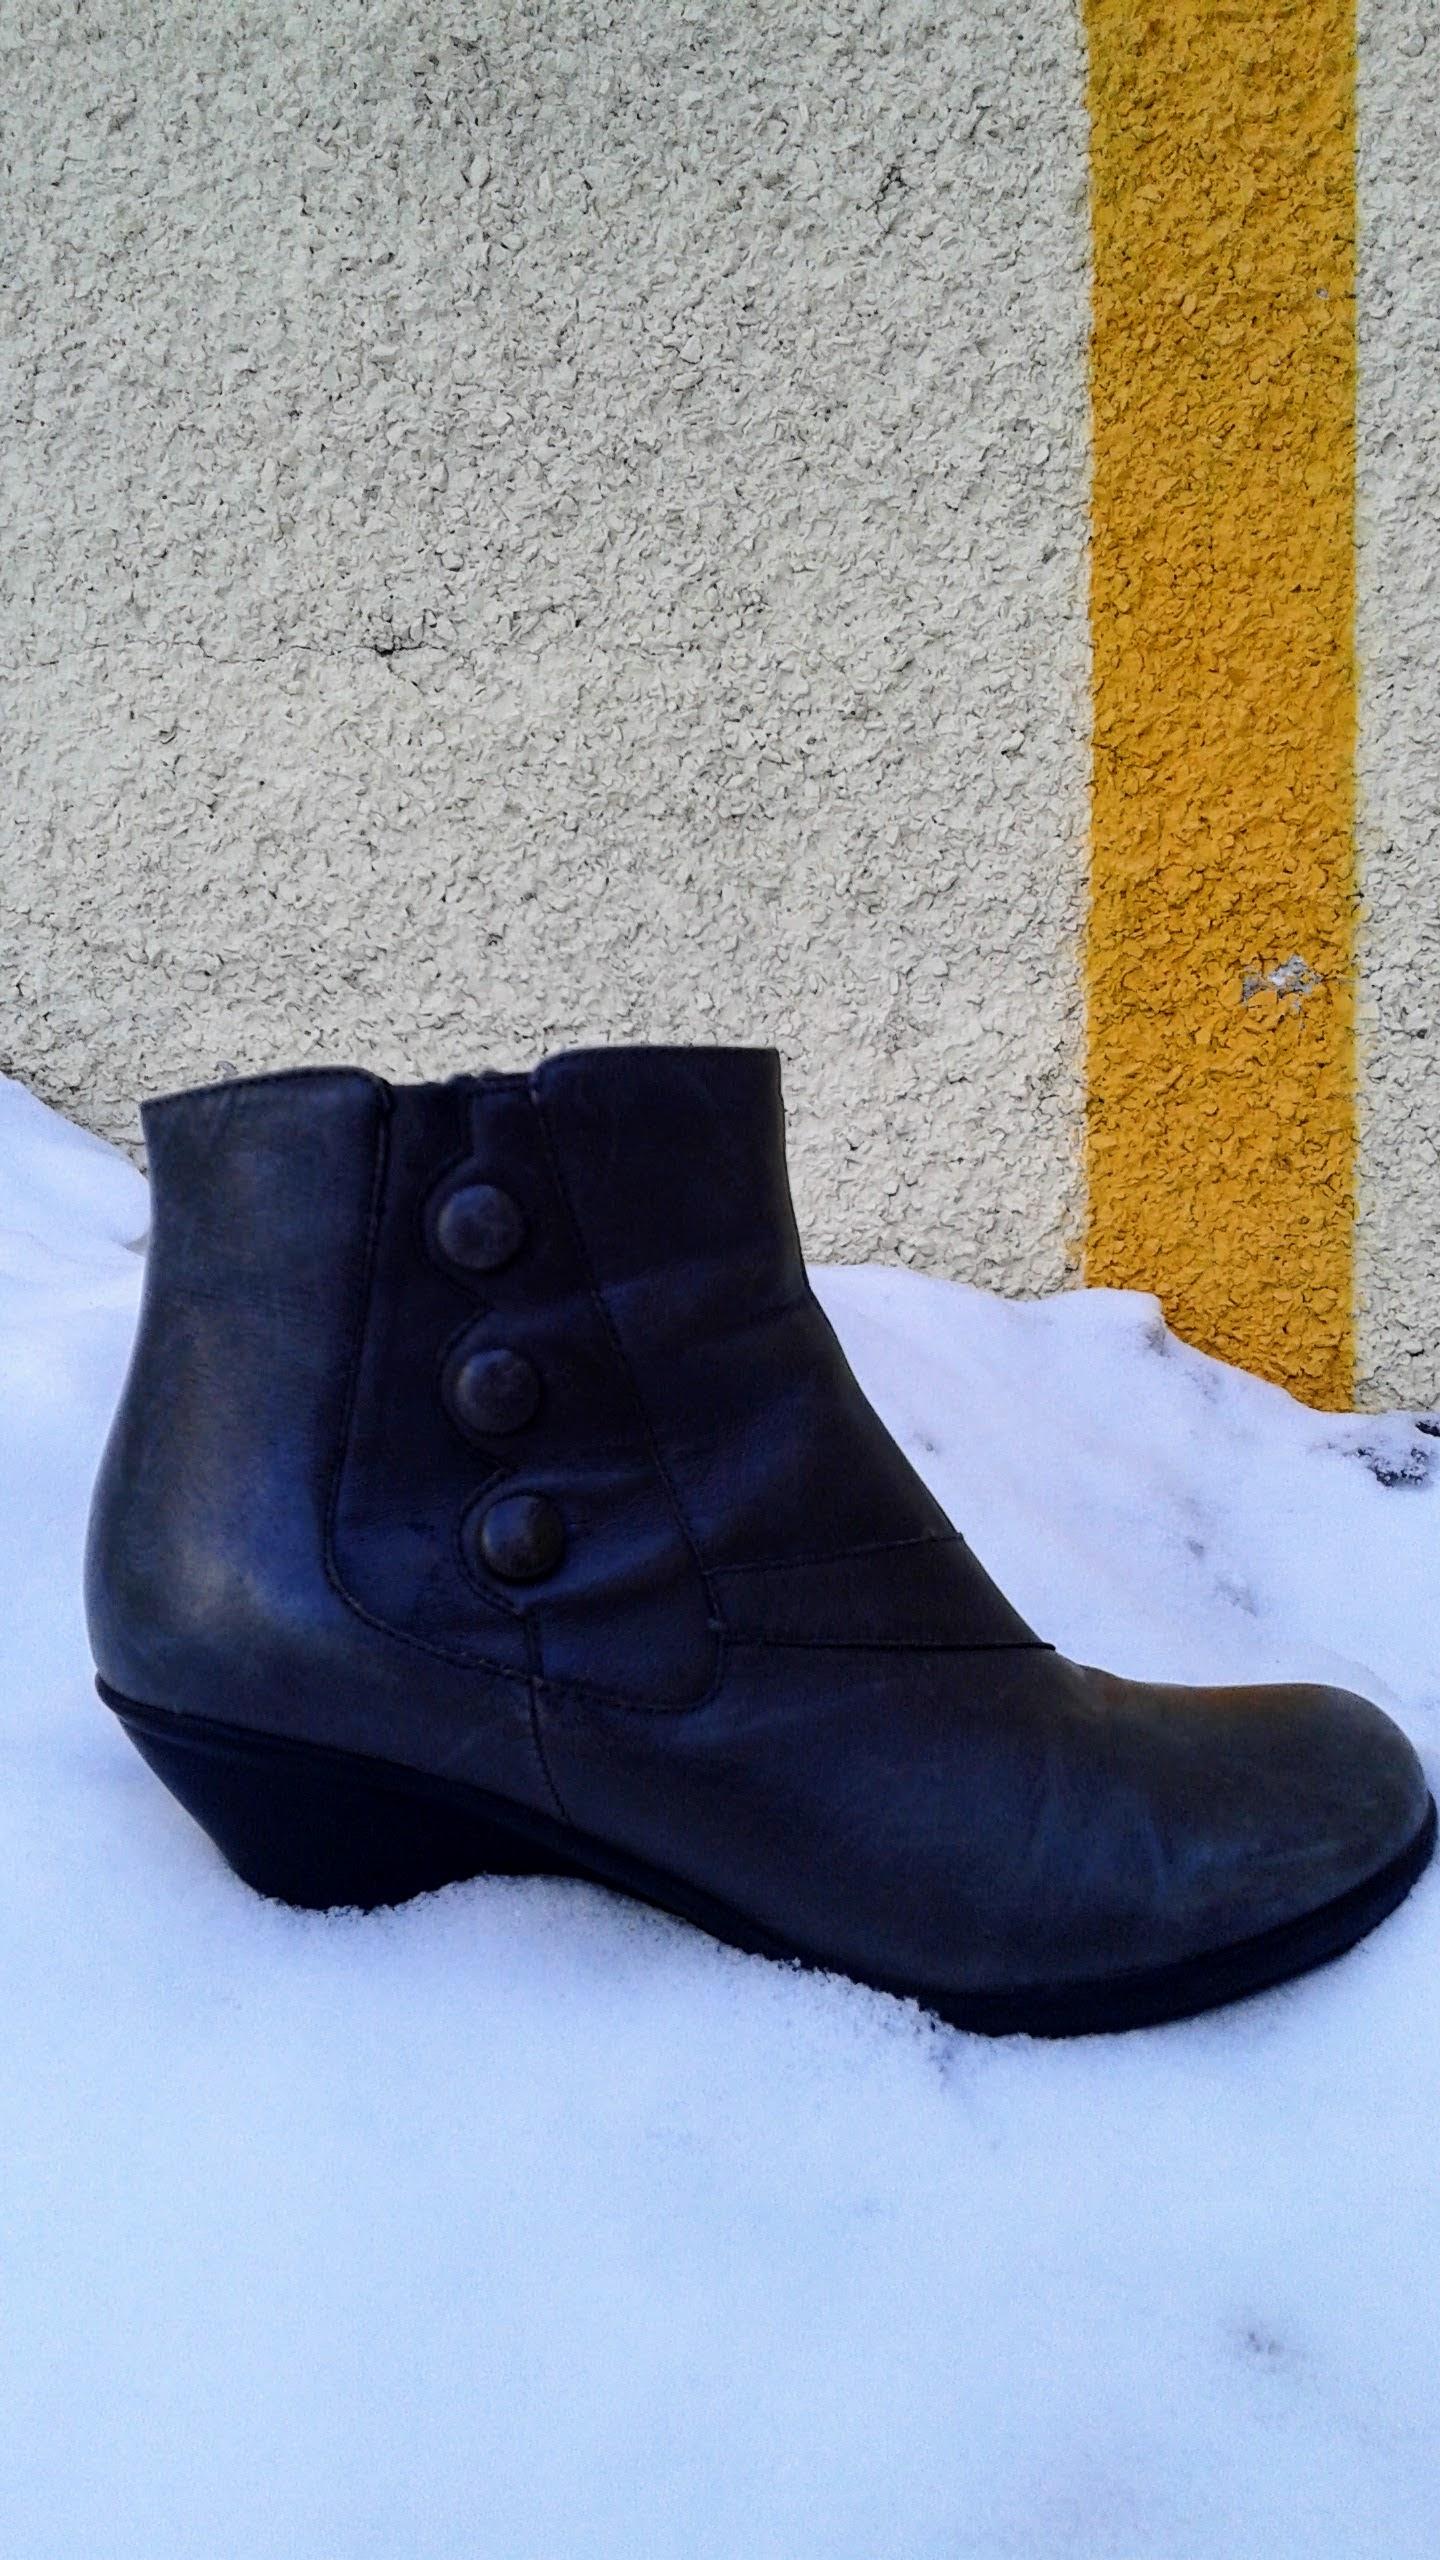 Miz Mooz boots; S8.5, $65